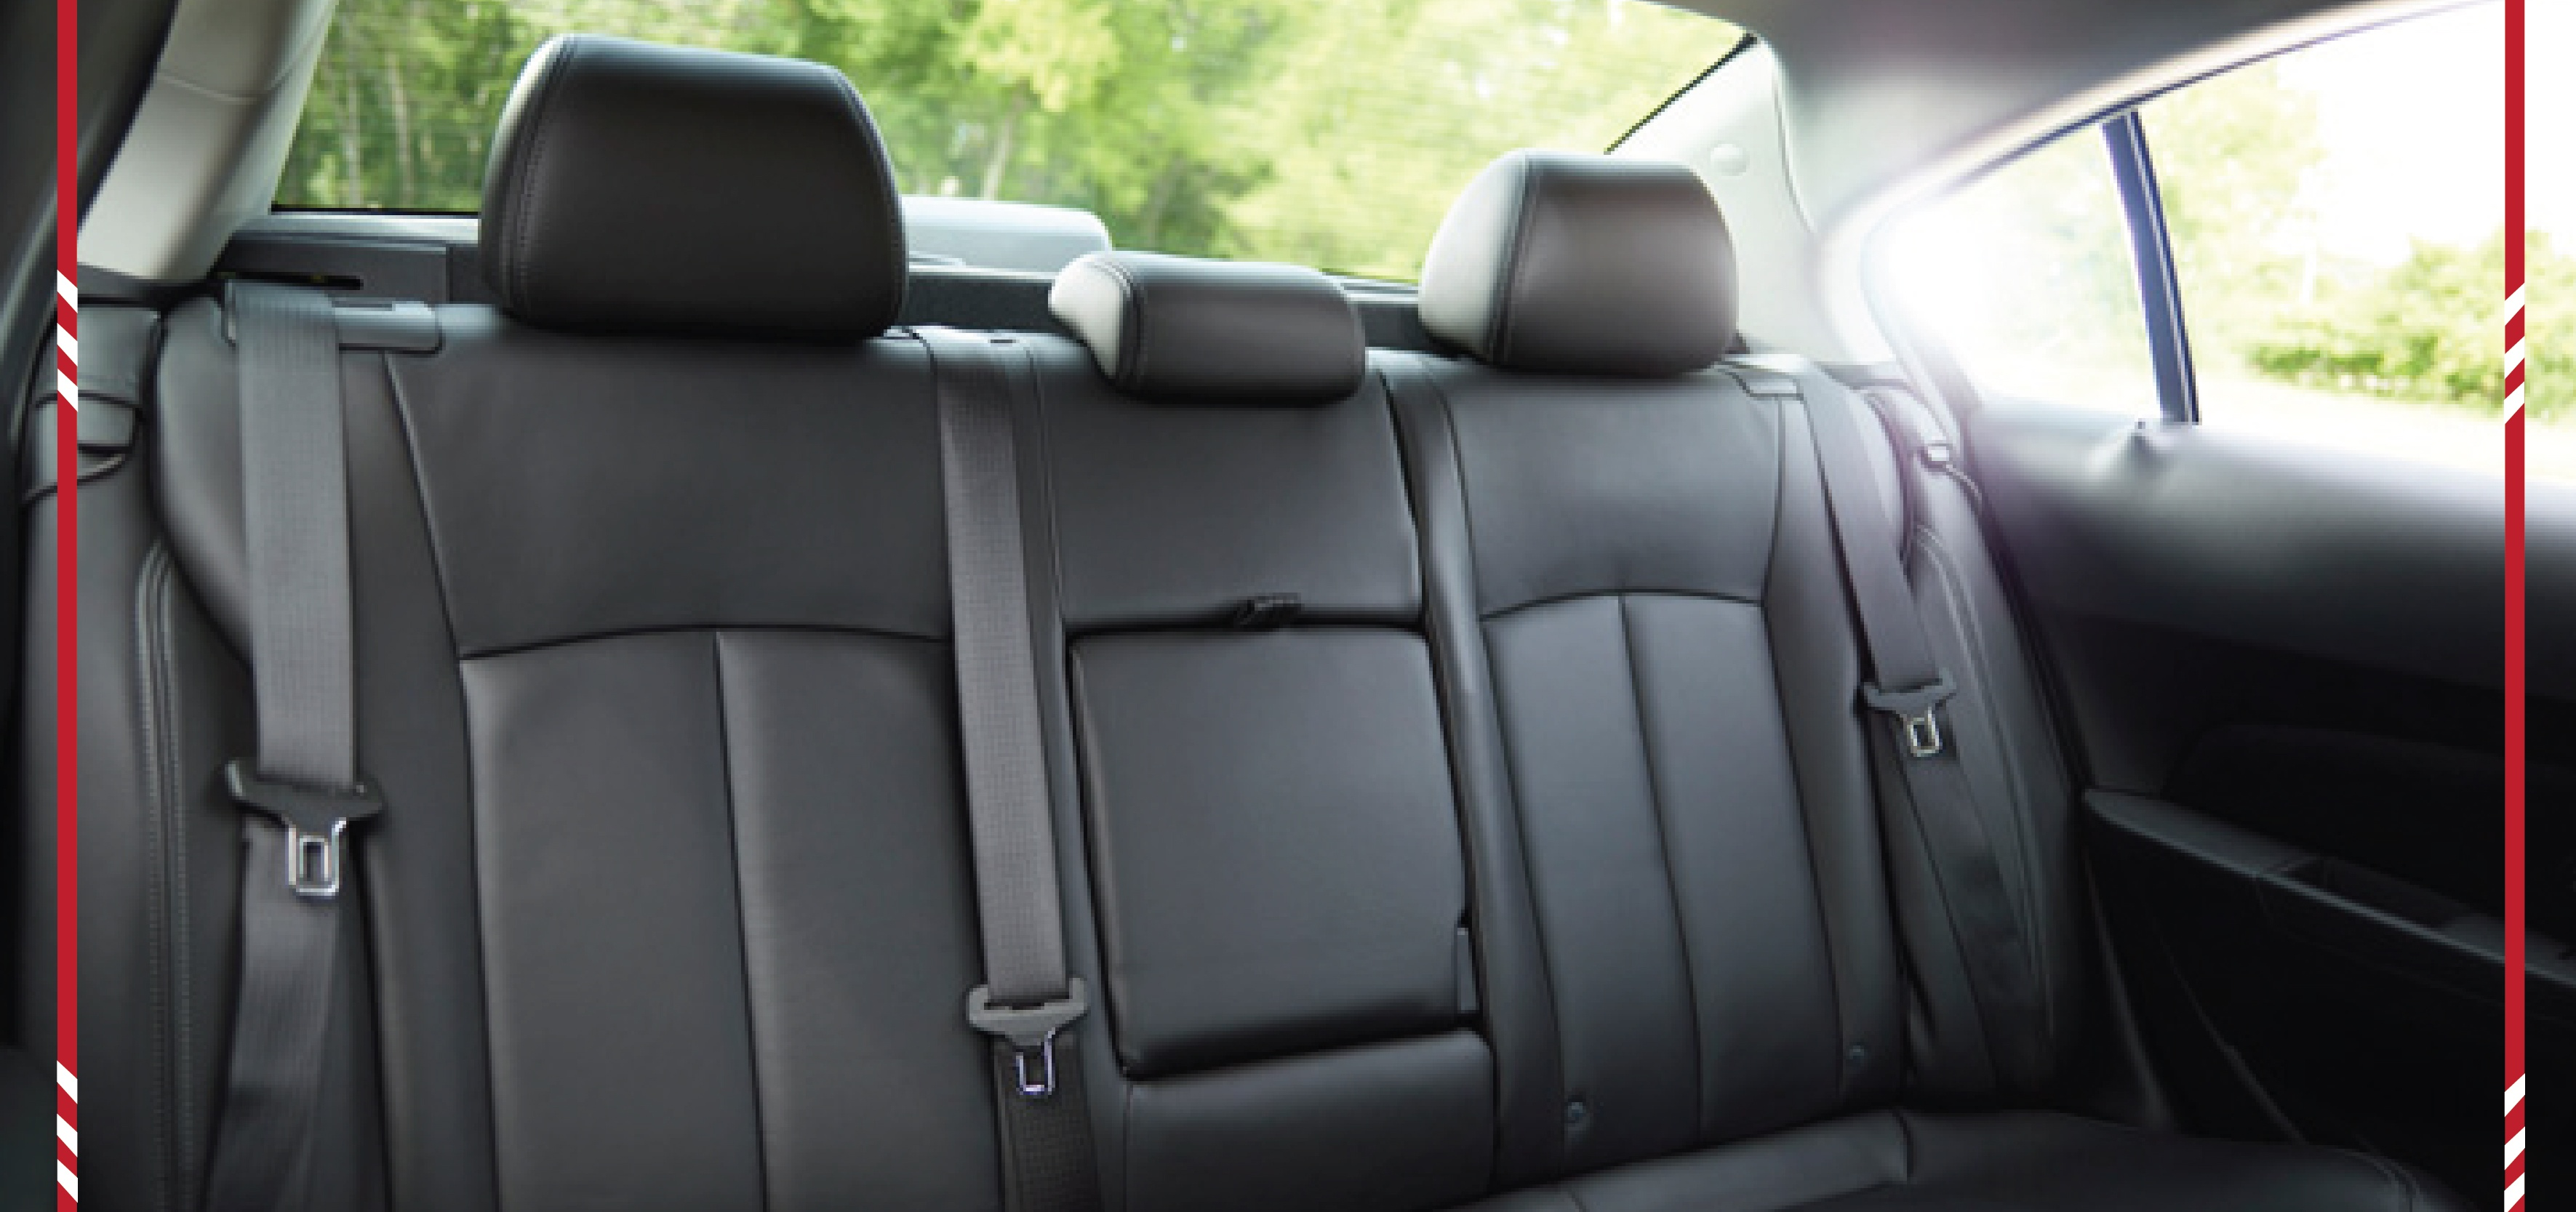 Chevrolet Cruze Interior 4